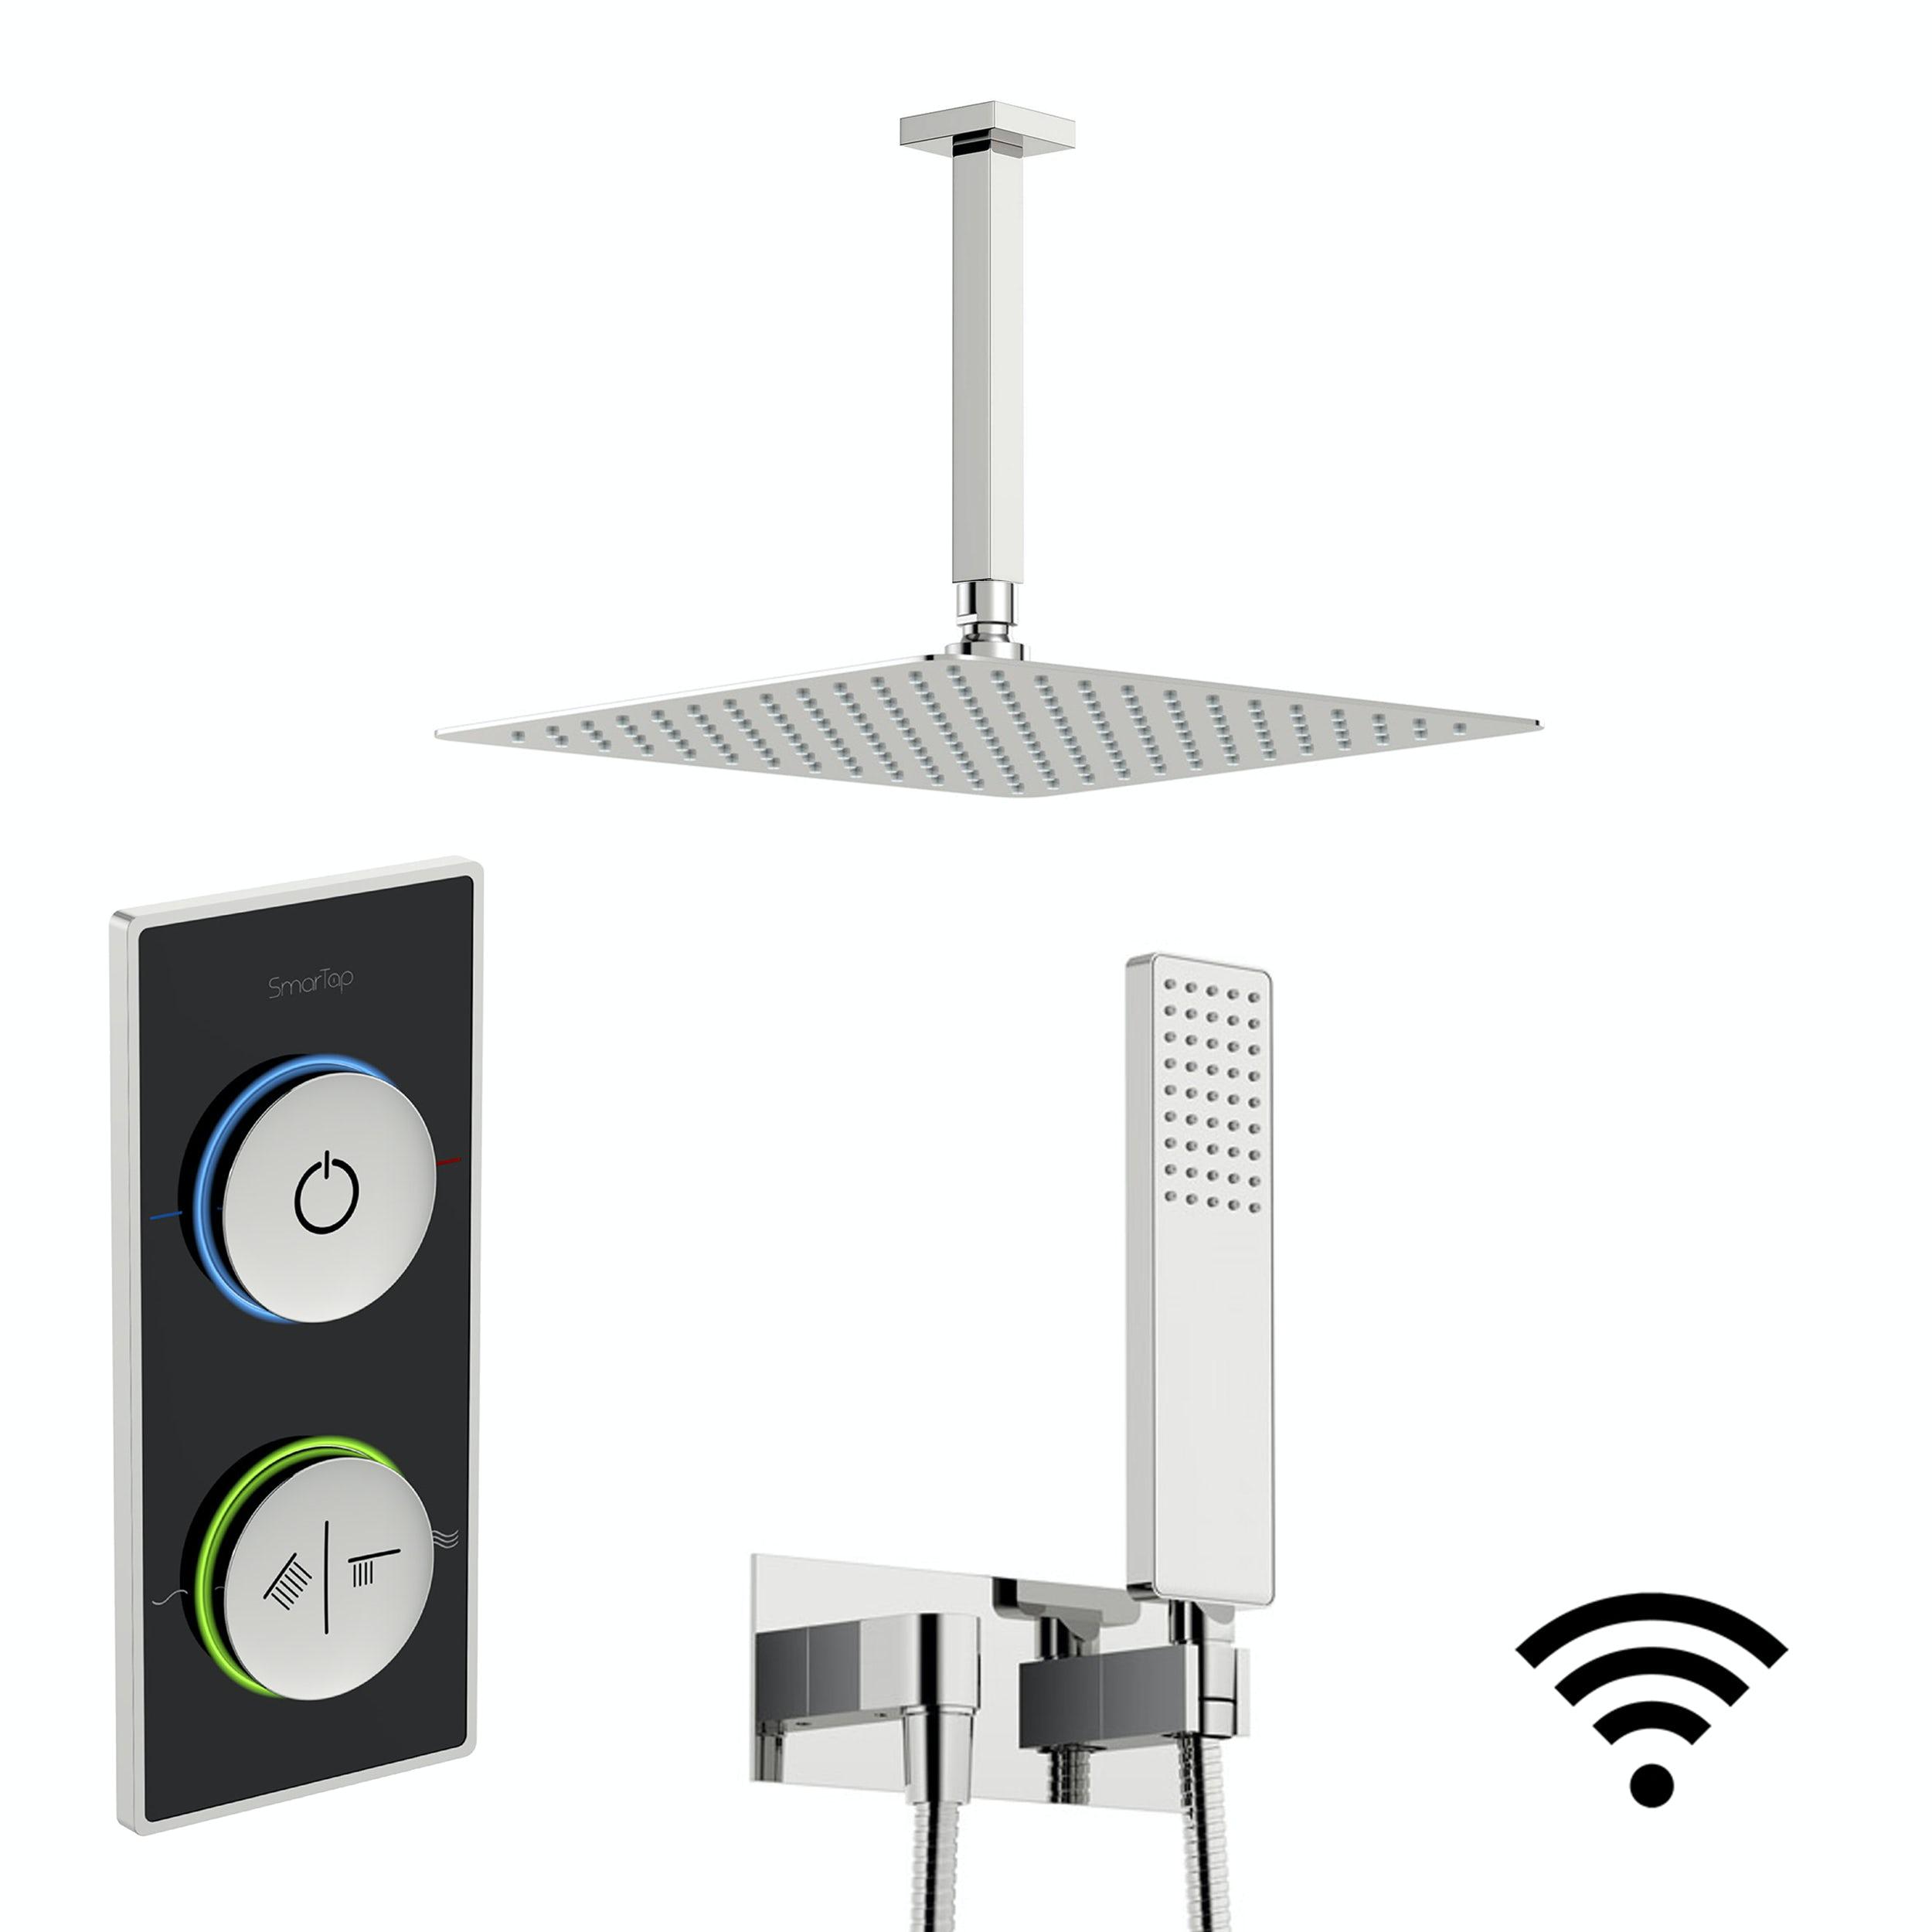 SmarTap black smart shower system with square wall outlet set